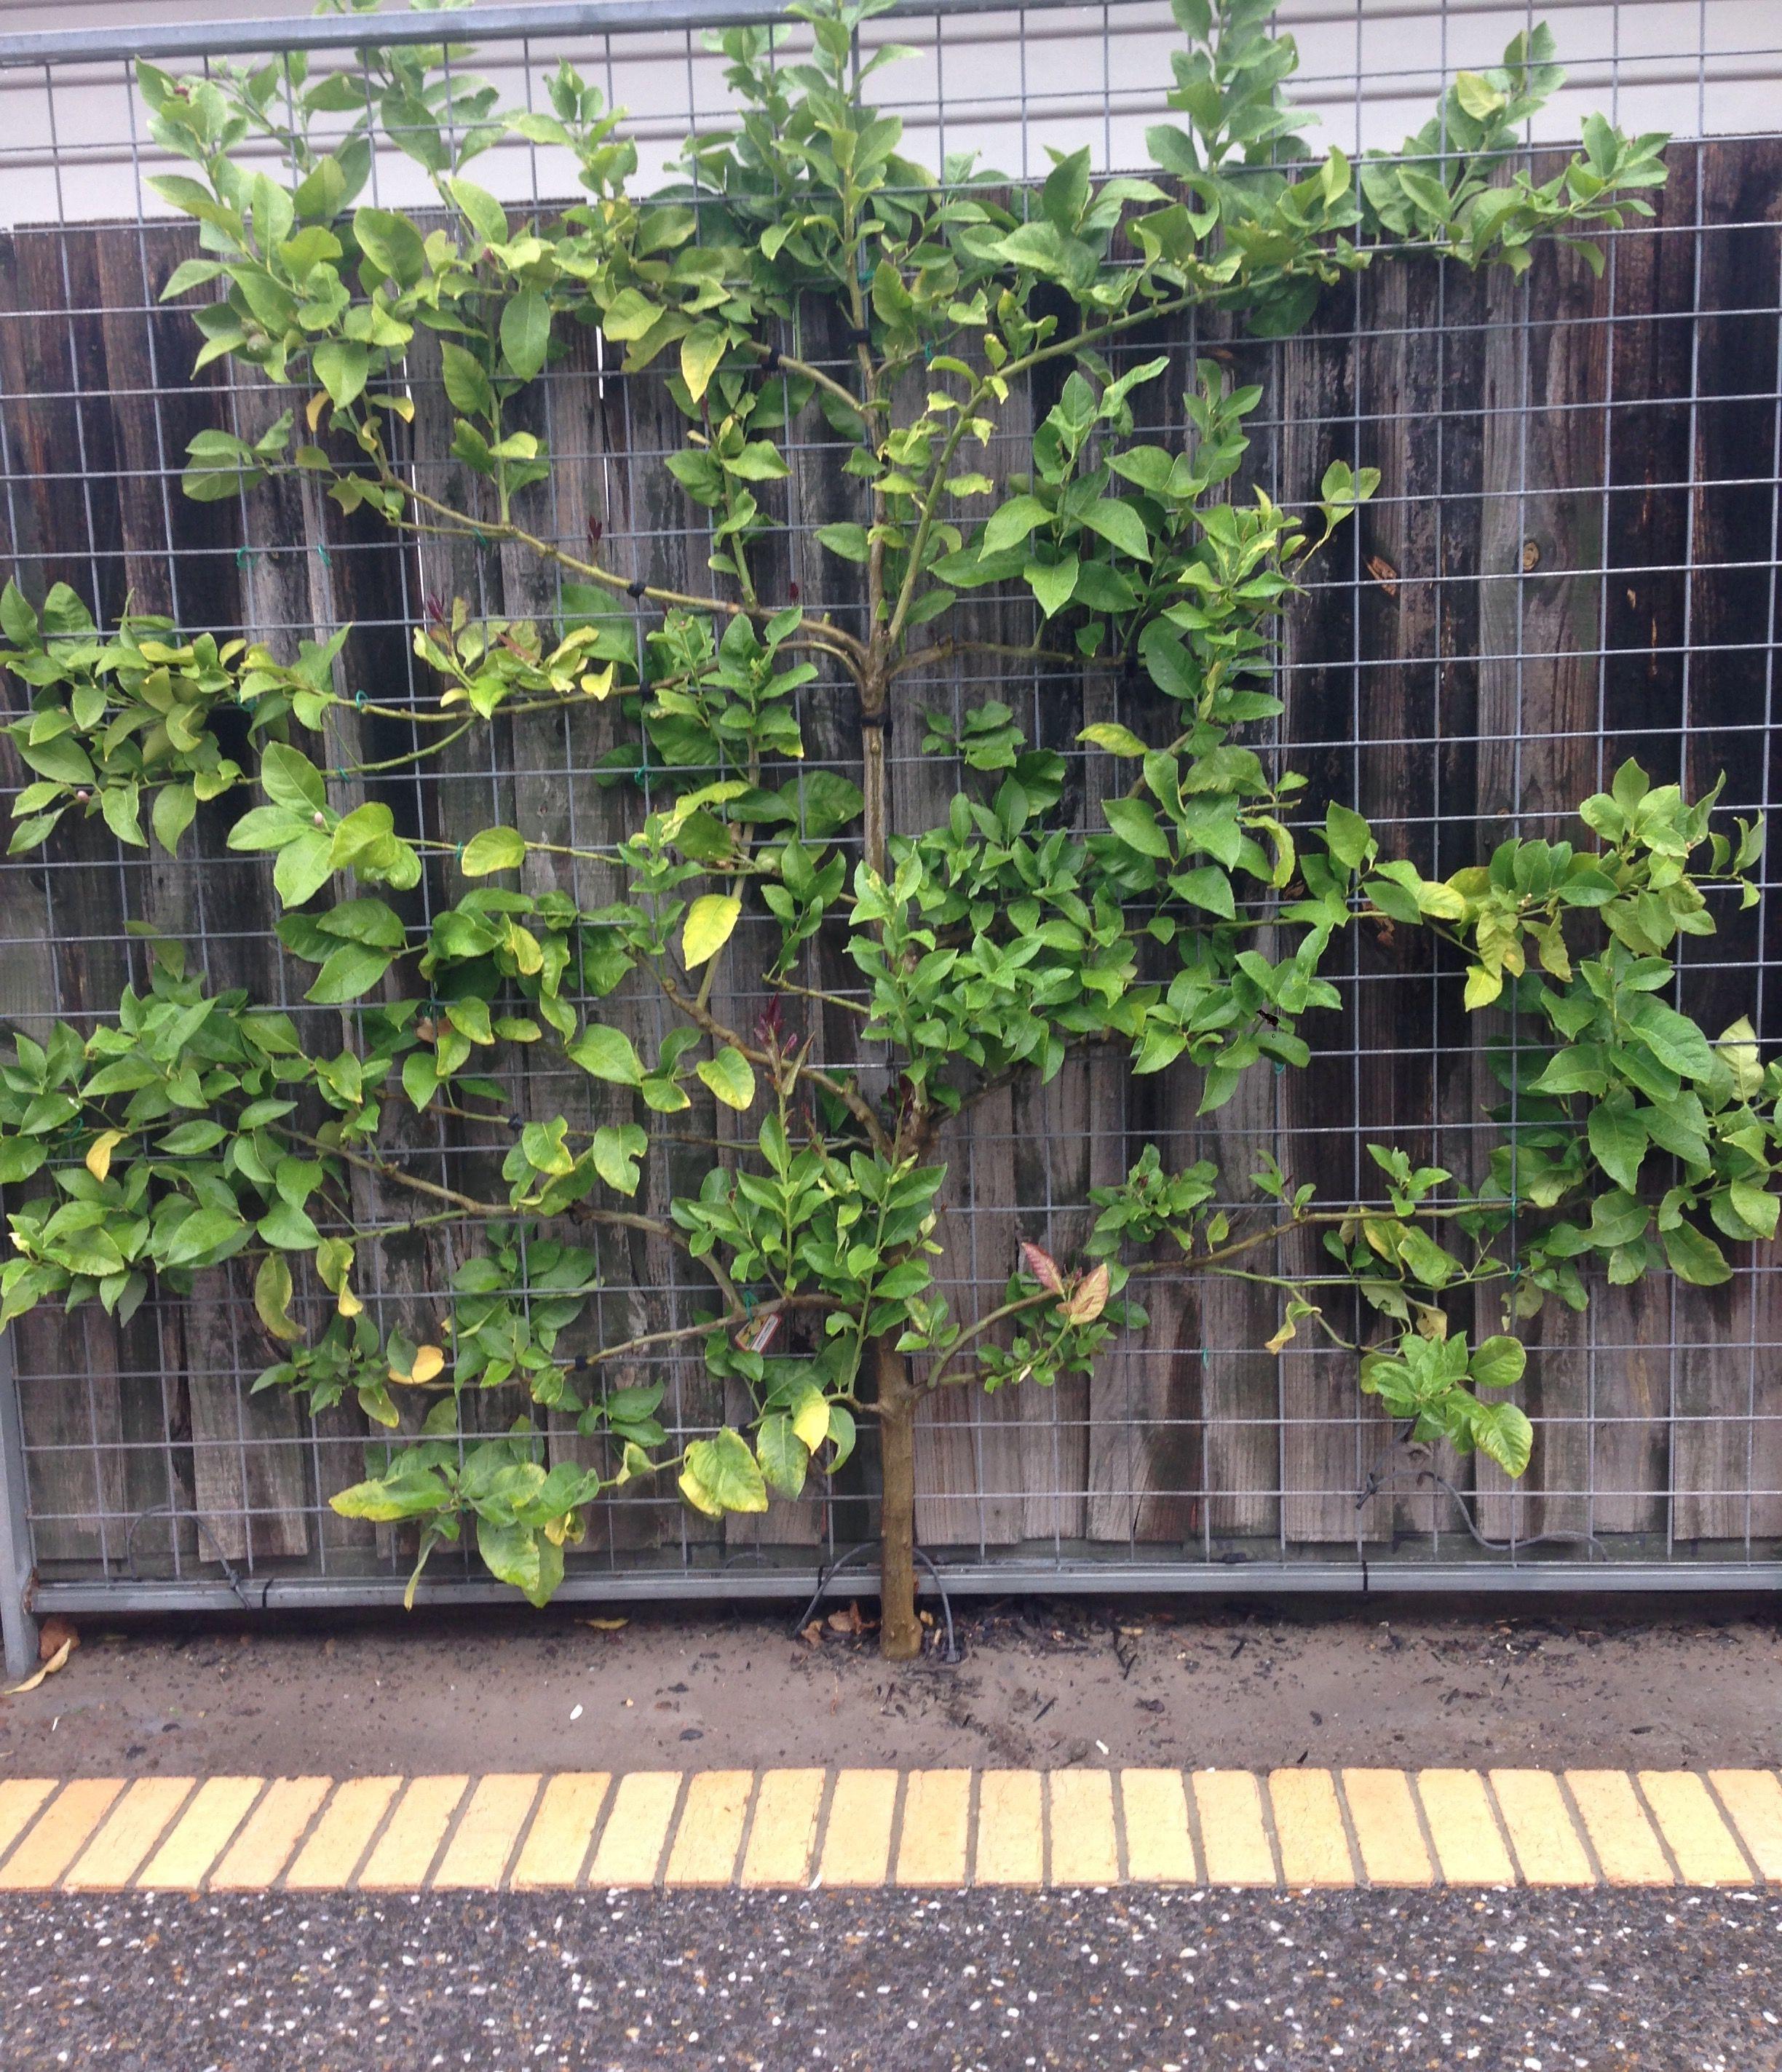 Espalier Frame With A Lemon Tree Informally Growing Against It Melbourne Trees To Plant Citrus Trees Garden Trellis